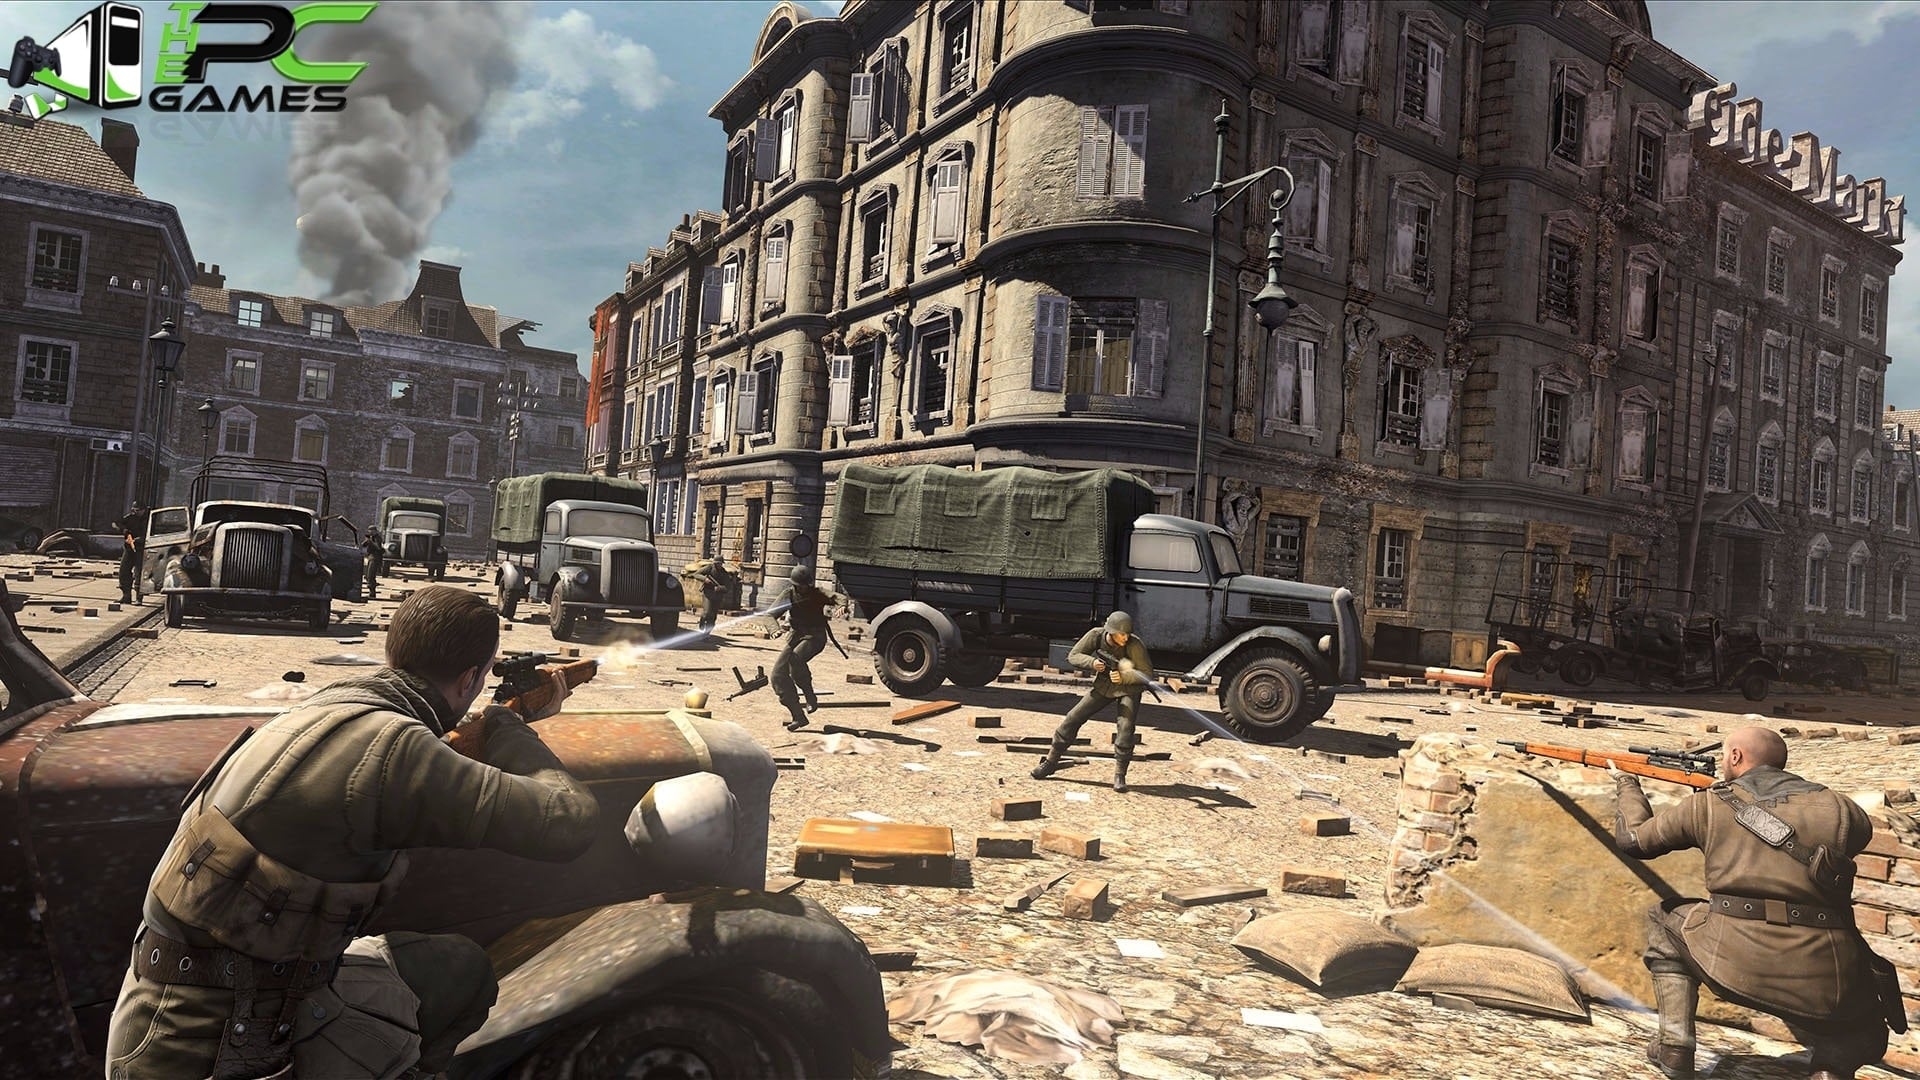 sniper elite v1 pc game free download full version